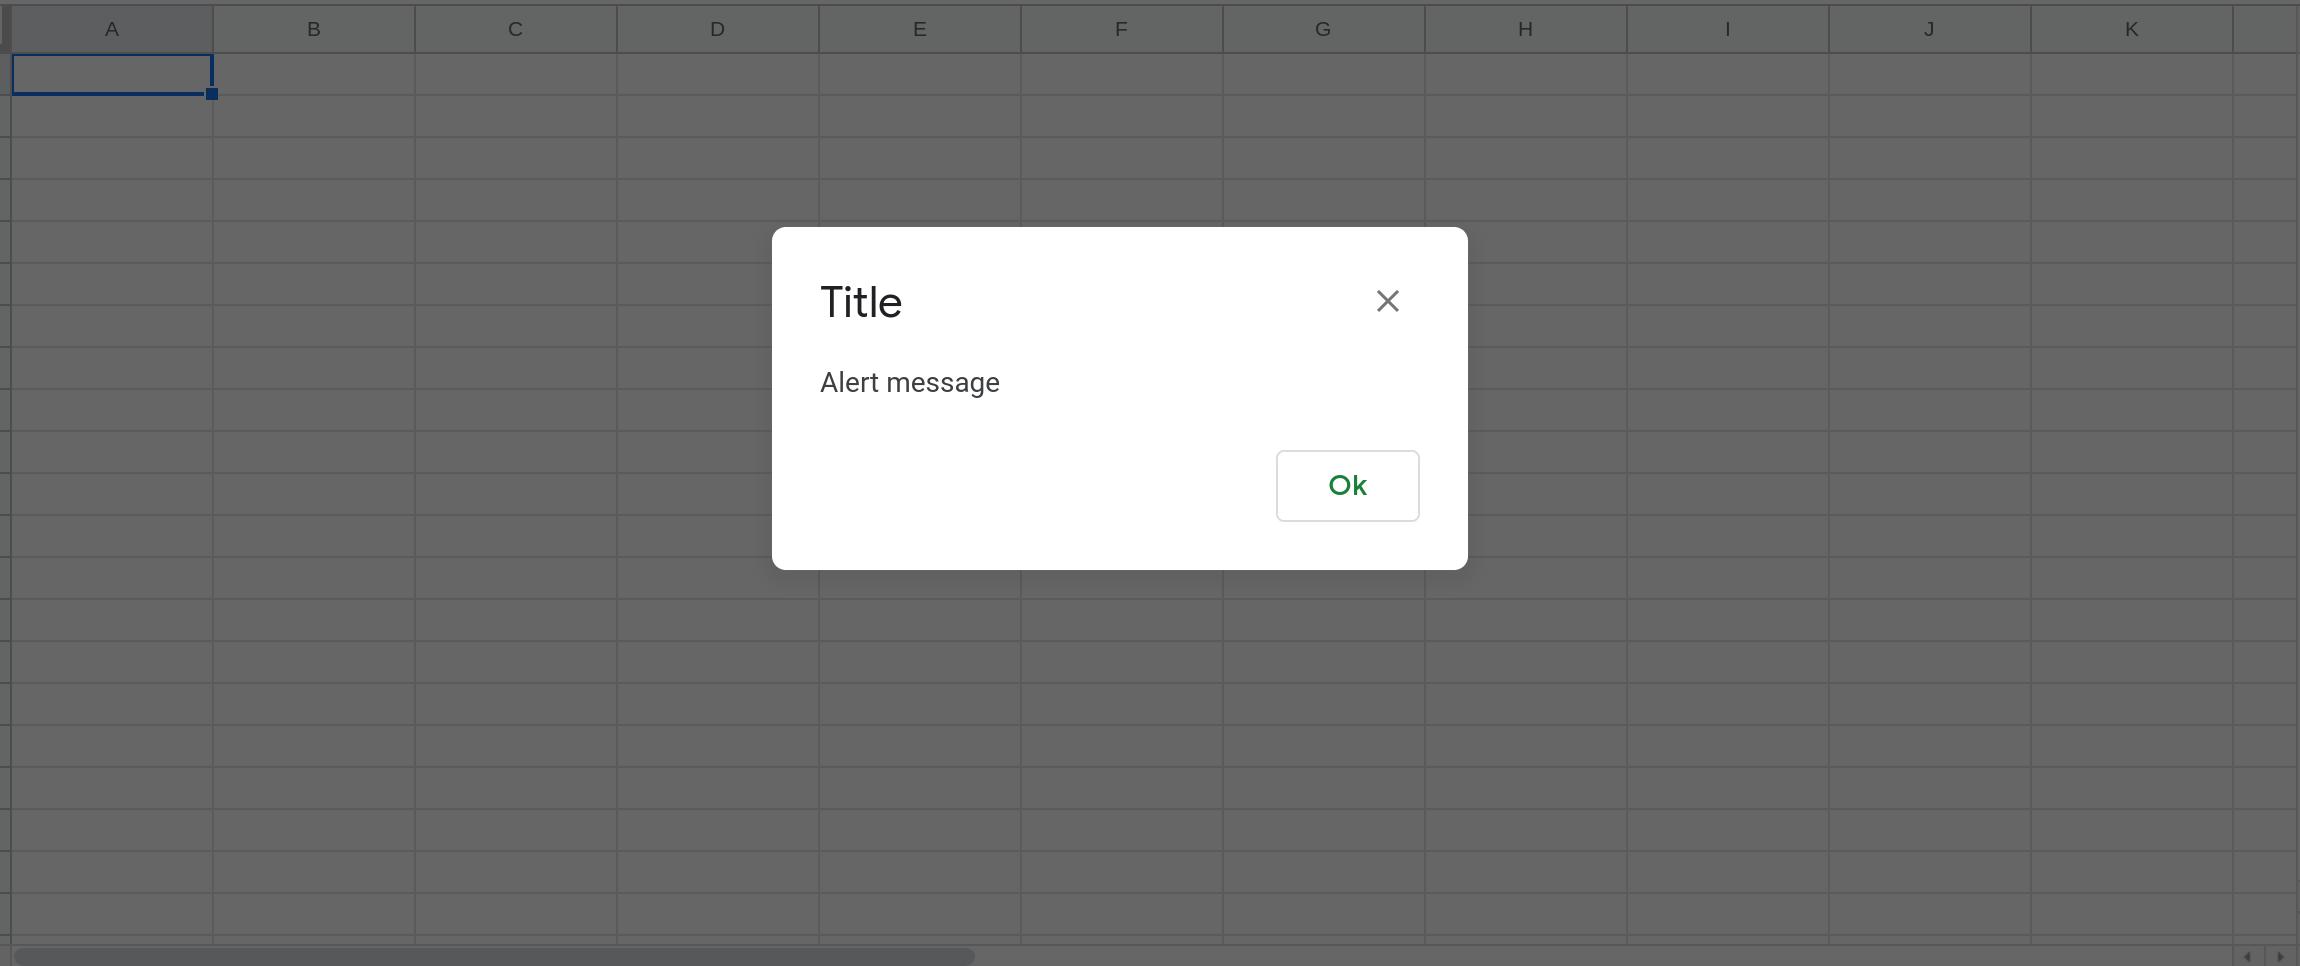 Screenshot of Google Sheets with an alert message displayed.